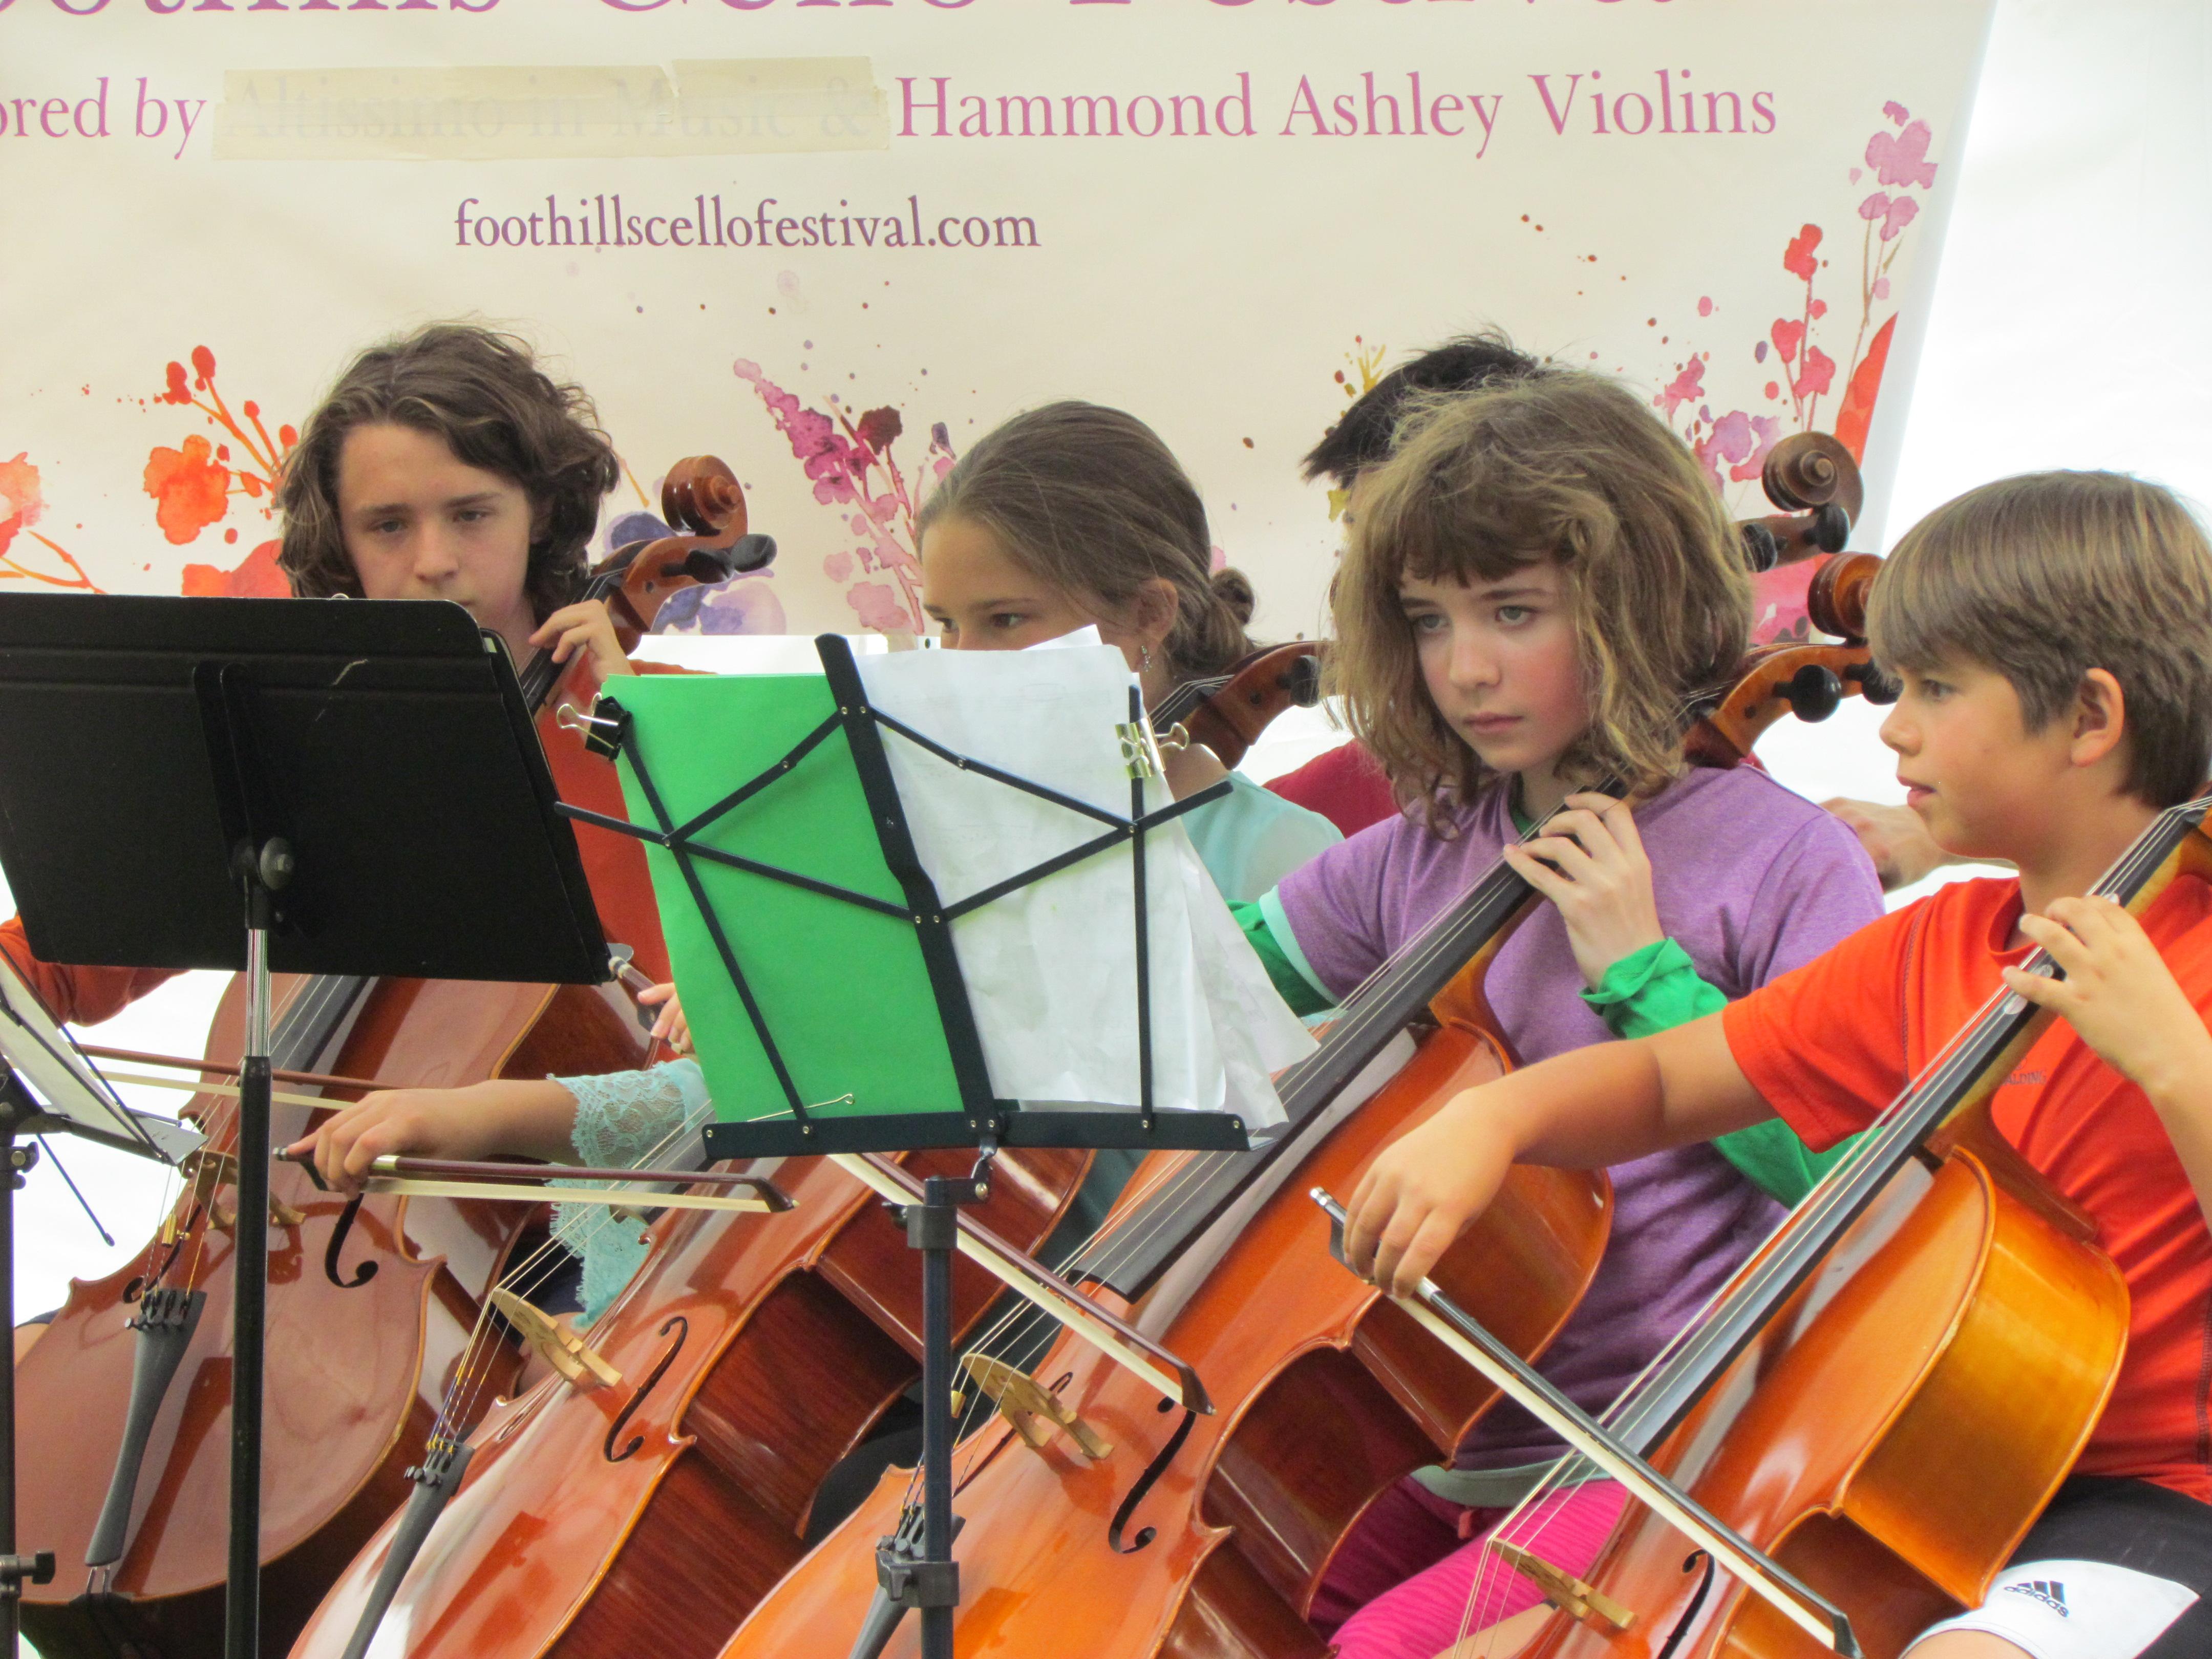 Cello festival concert